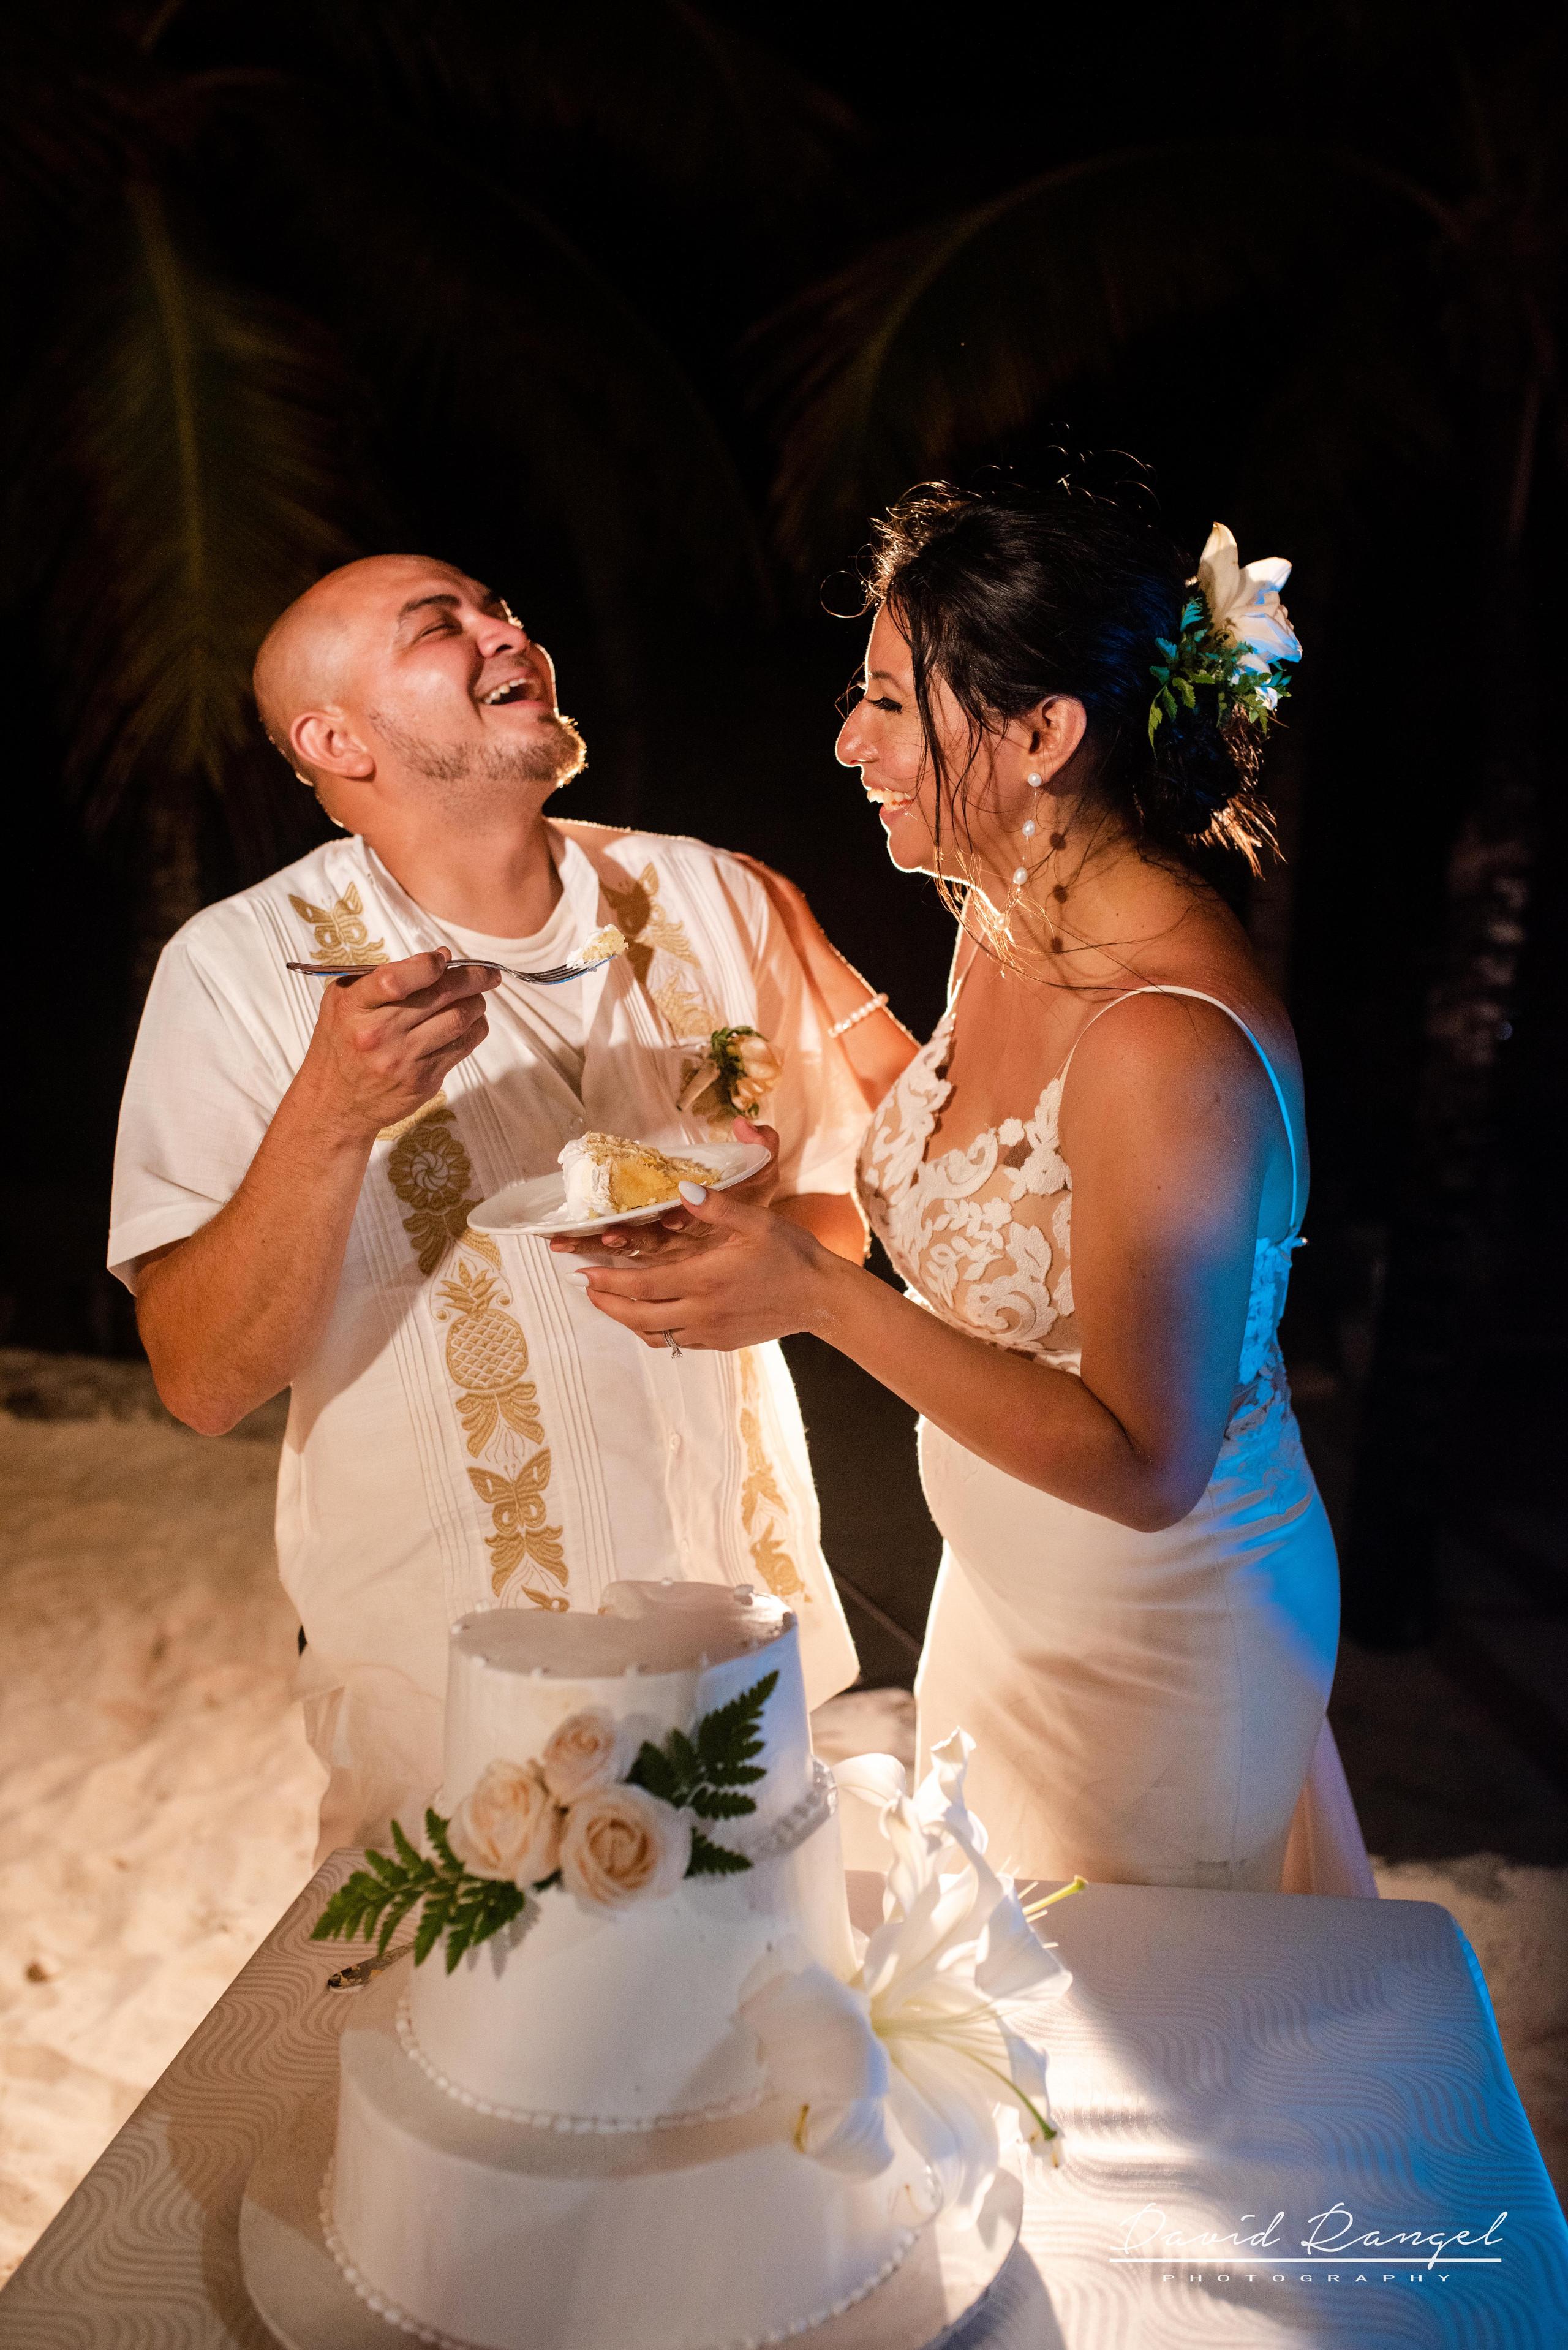 cake+cutting+reception+bride+groom+occidental+xcaret